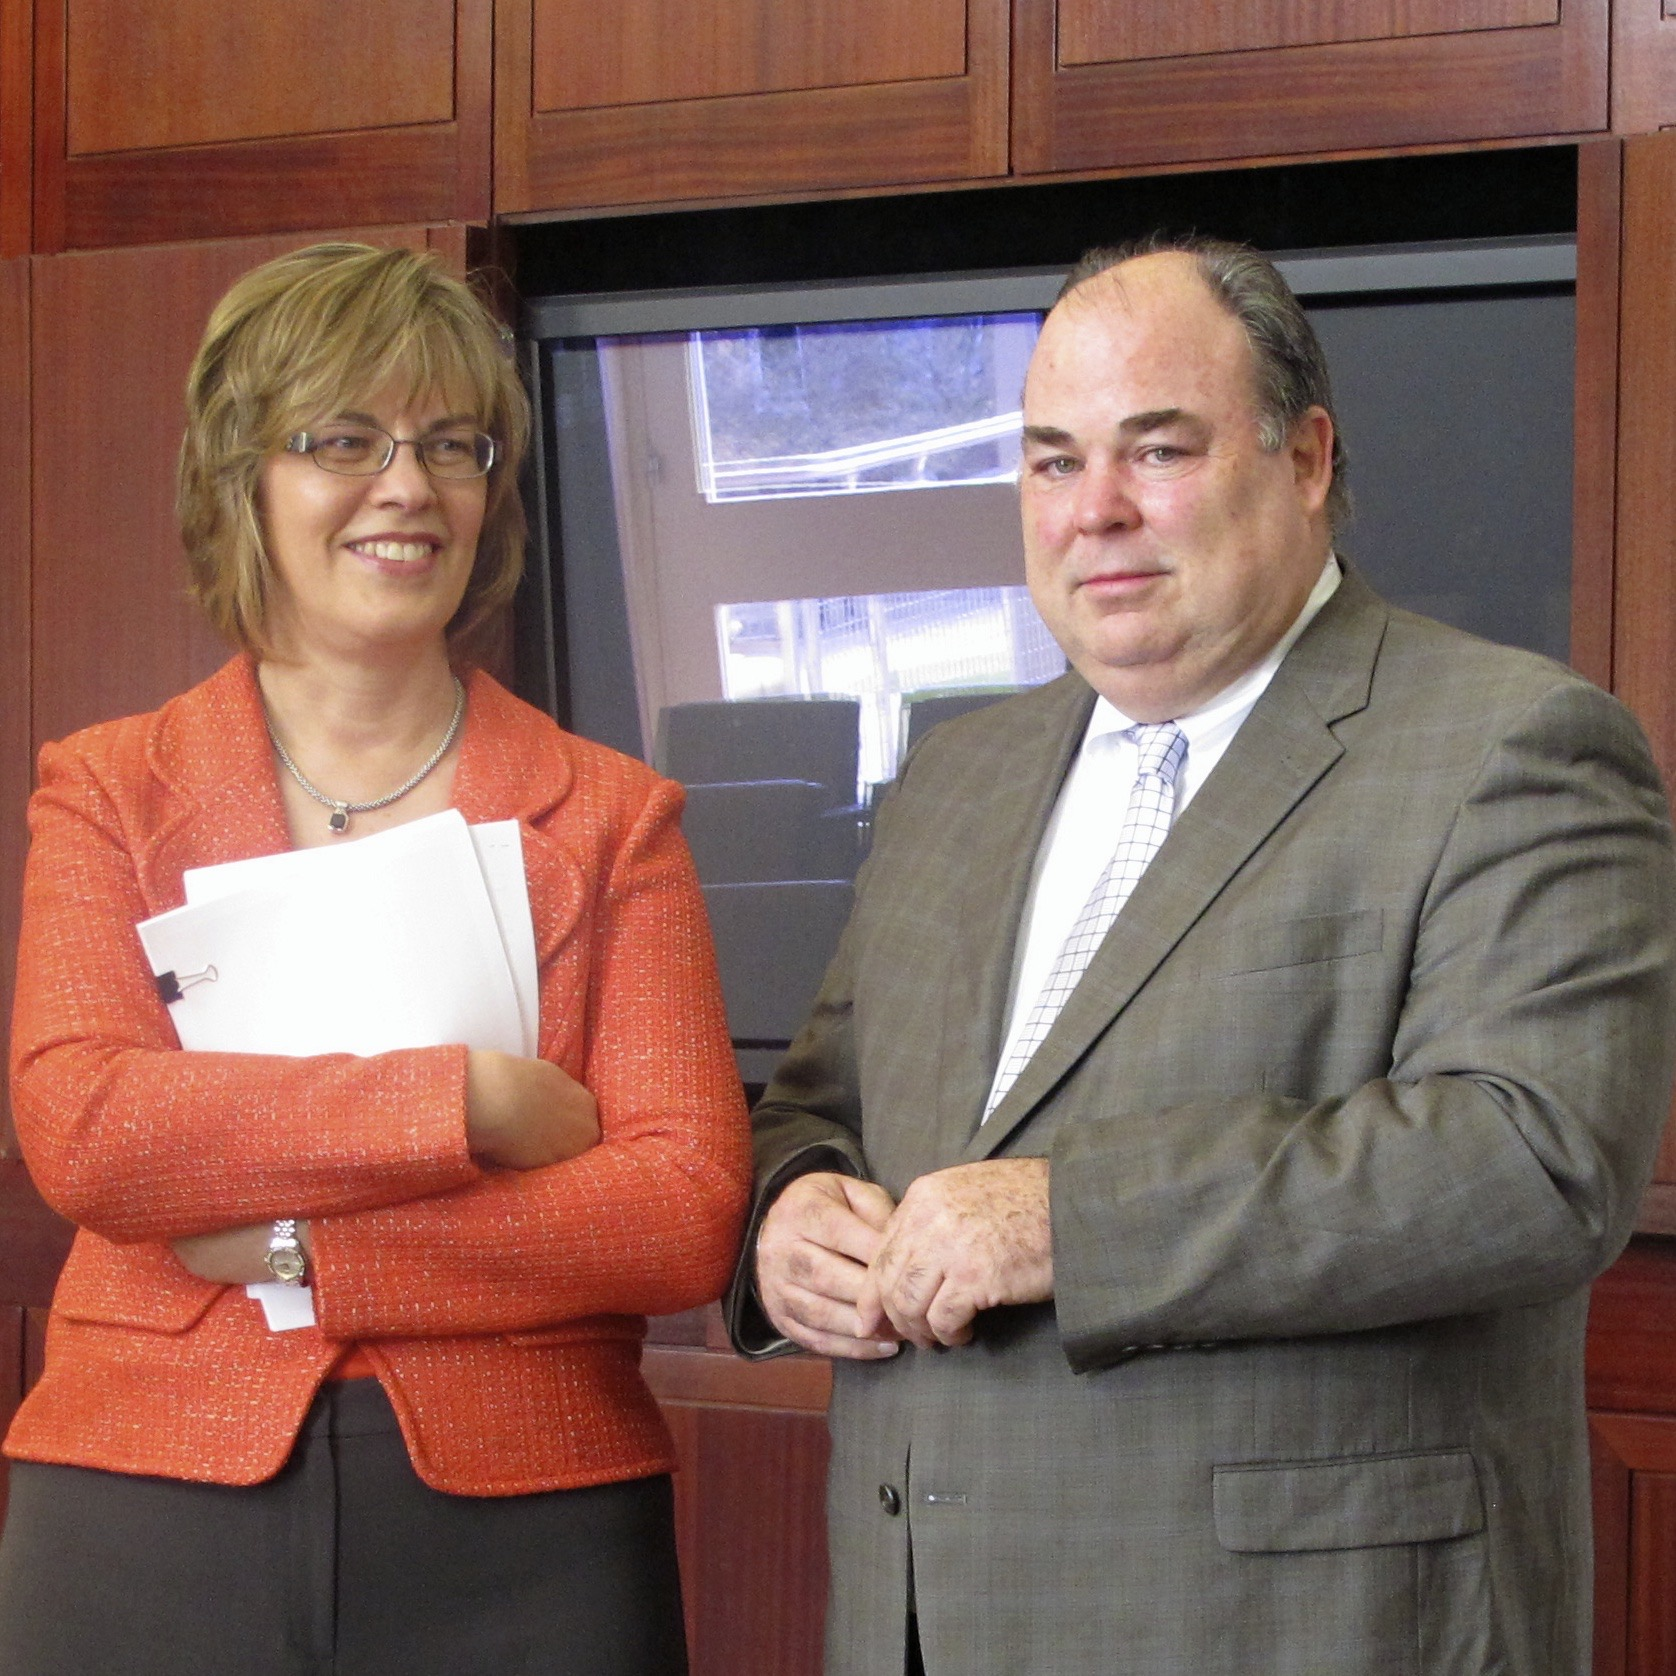 With Popeyes CEO Cheryl Bachelder